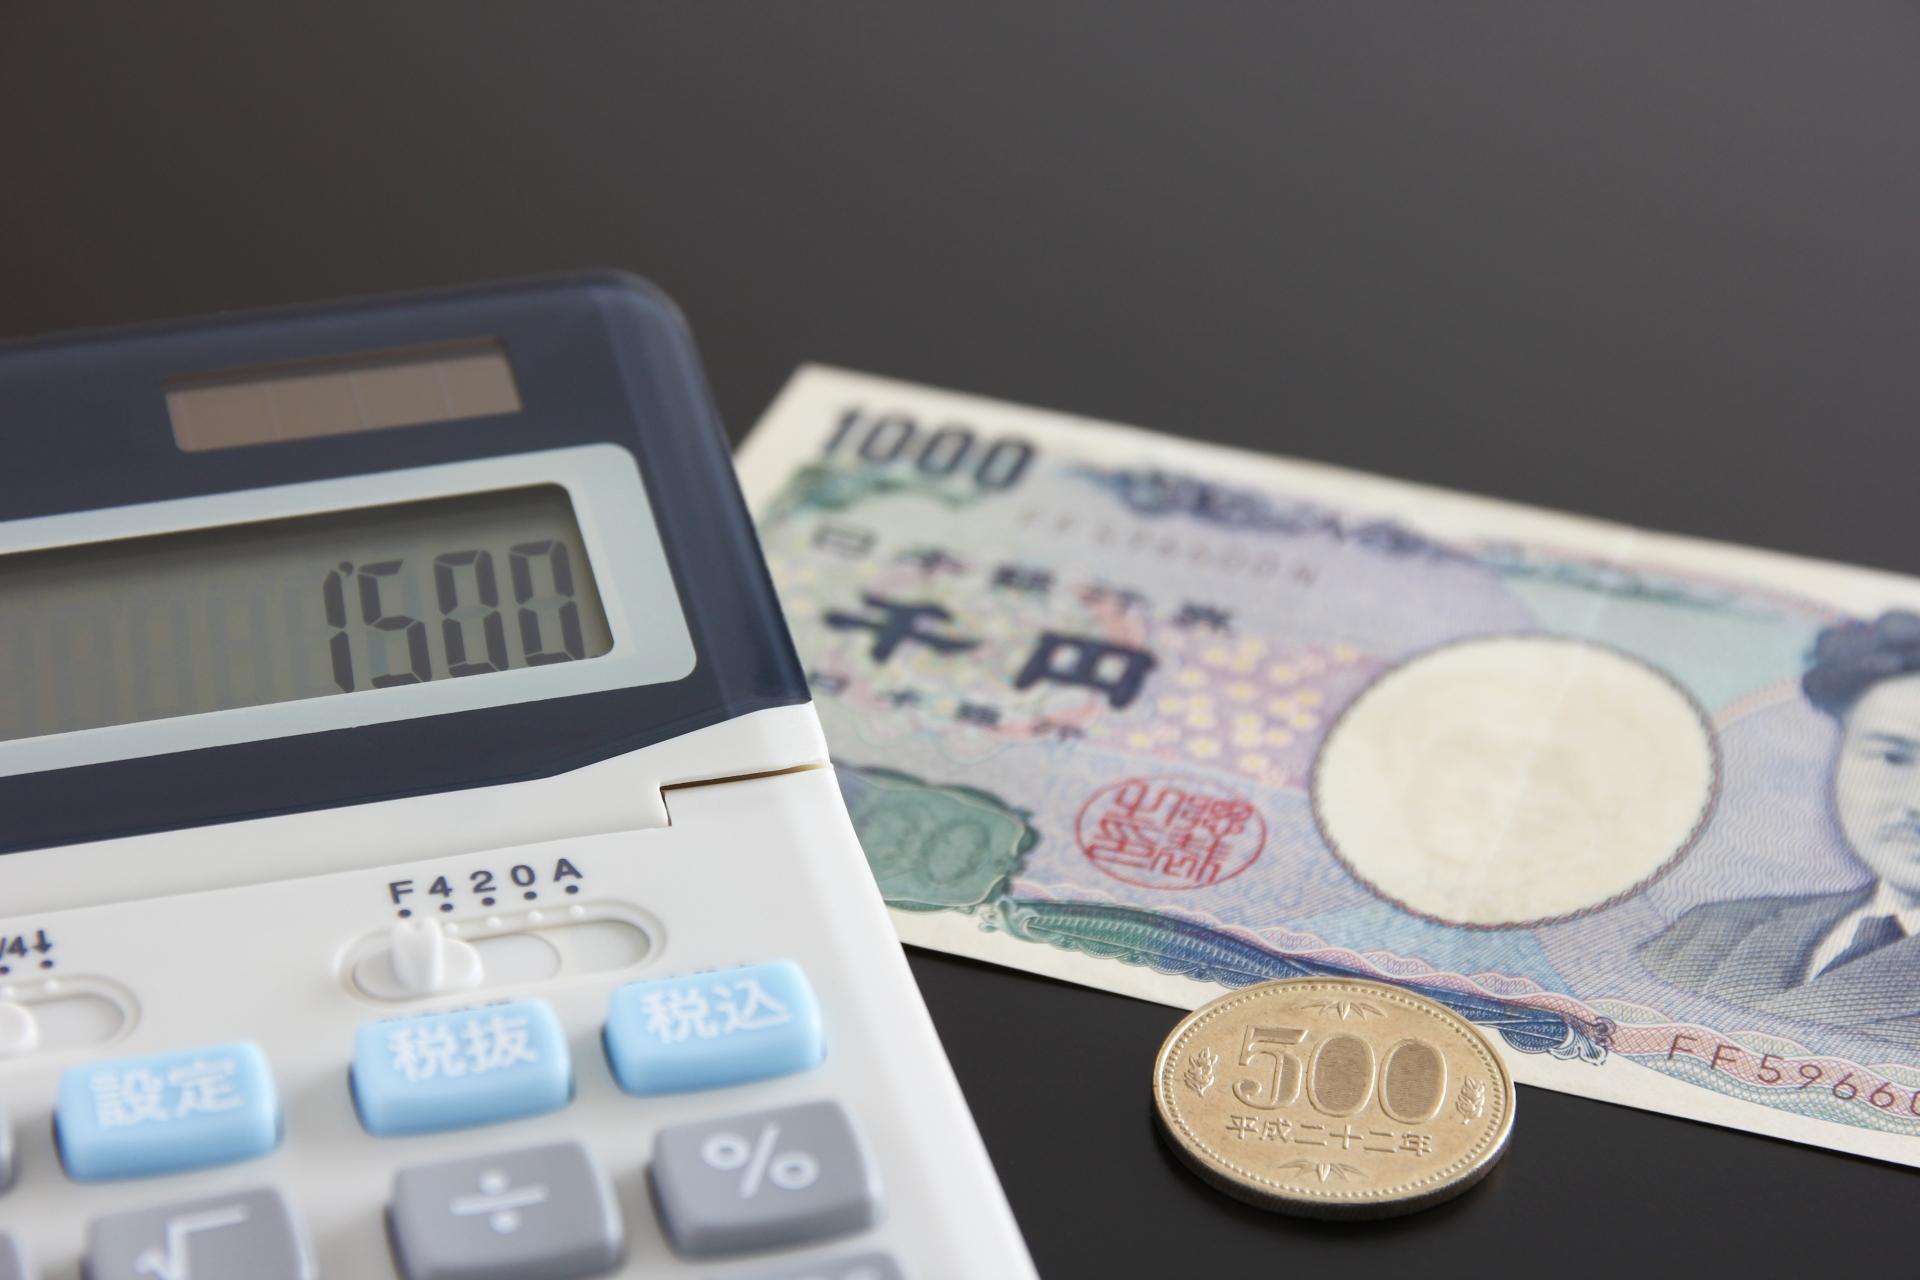 1500円